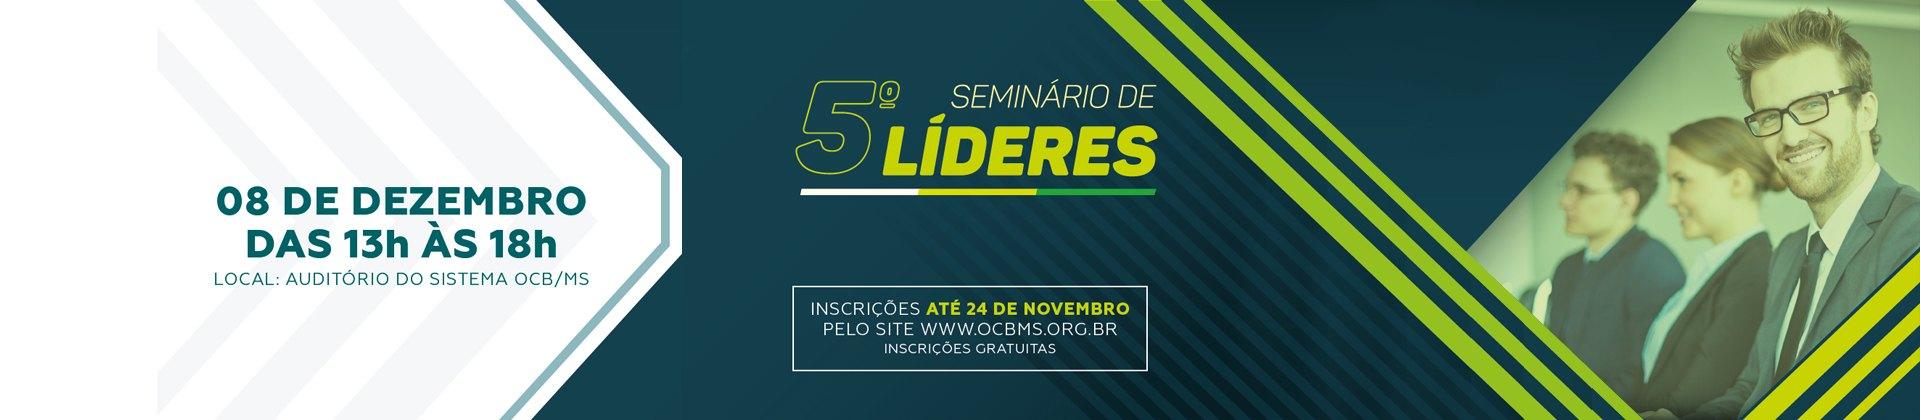 Banner_Sem_LIderes_Site